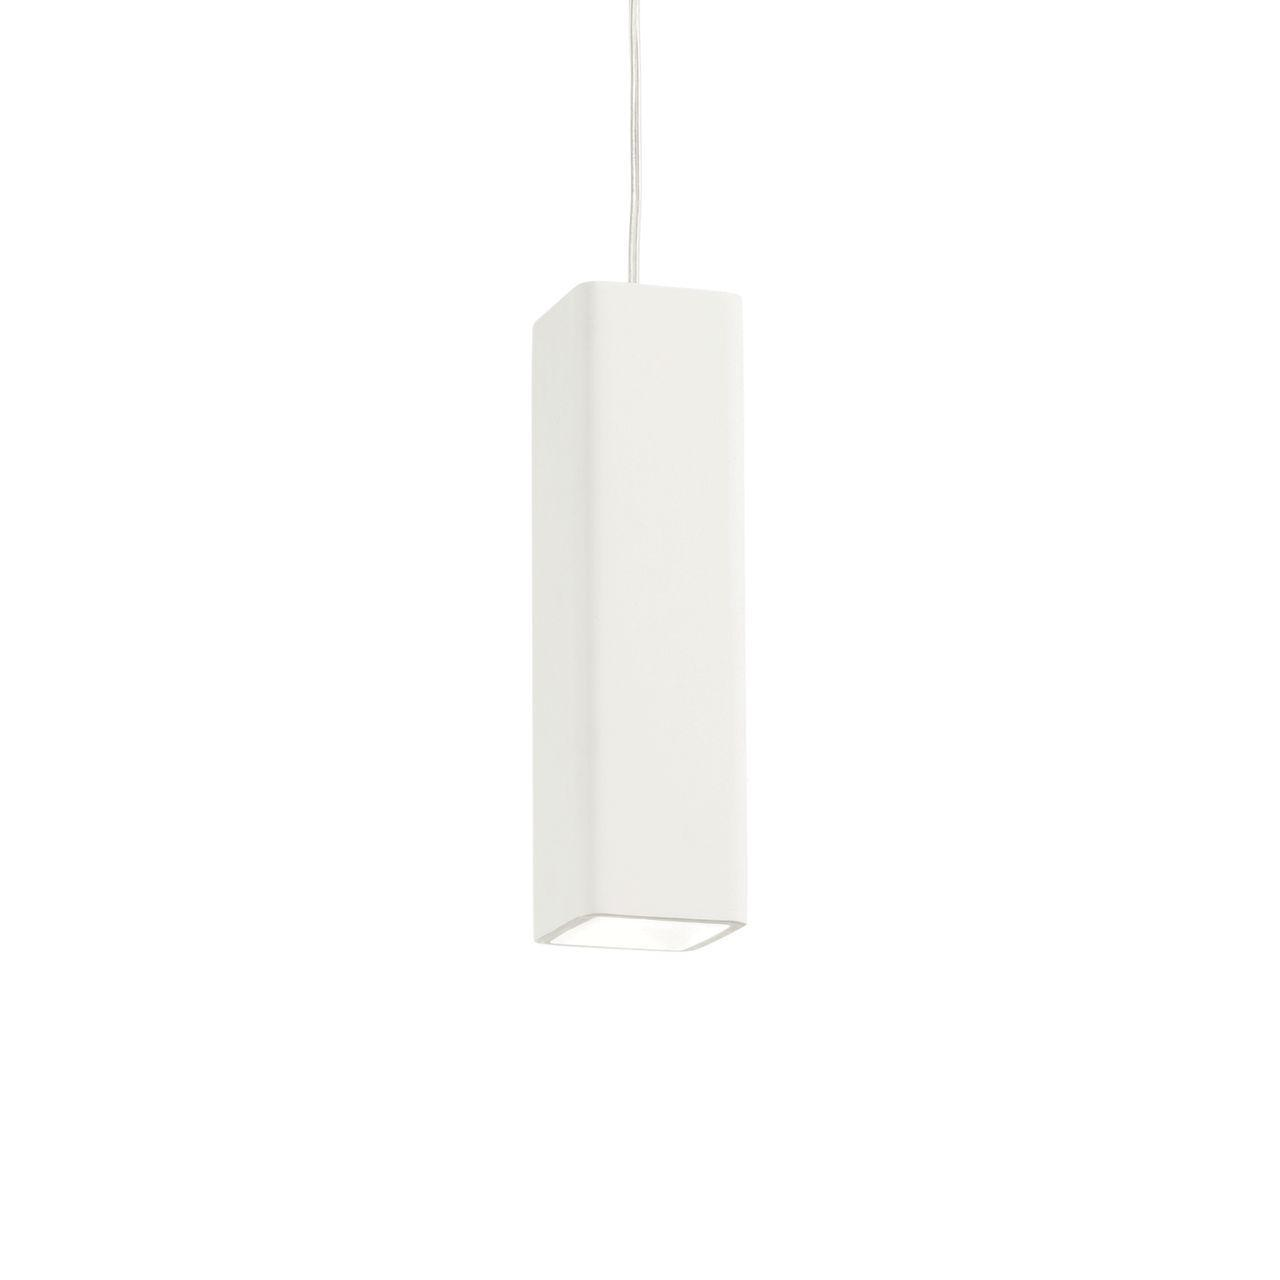 Подвесной светильник Ideal Lux Oak SP1 Square Bianco ideal record valley oak 601l 4м